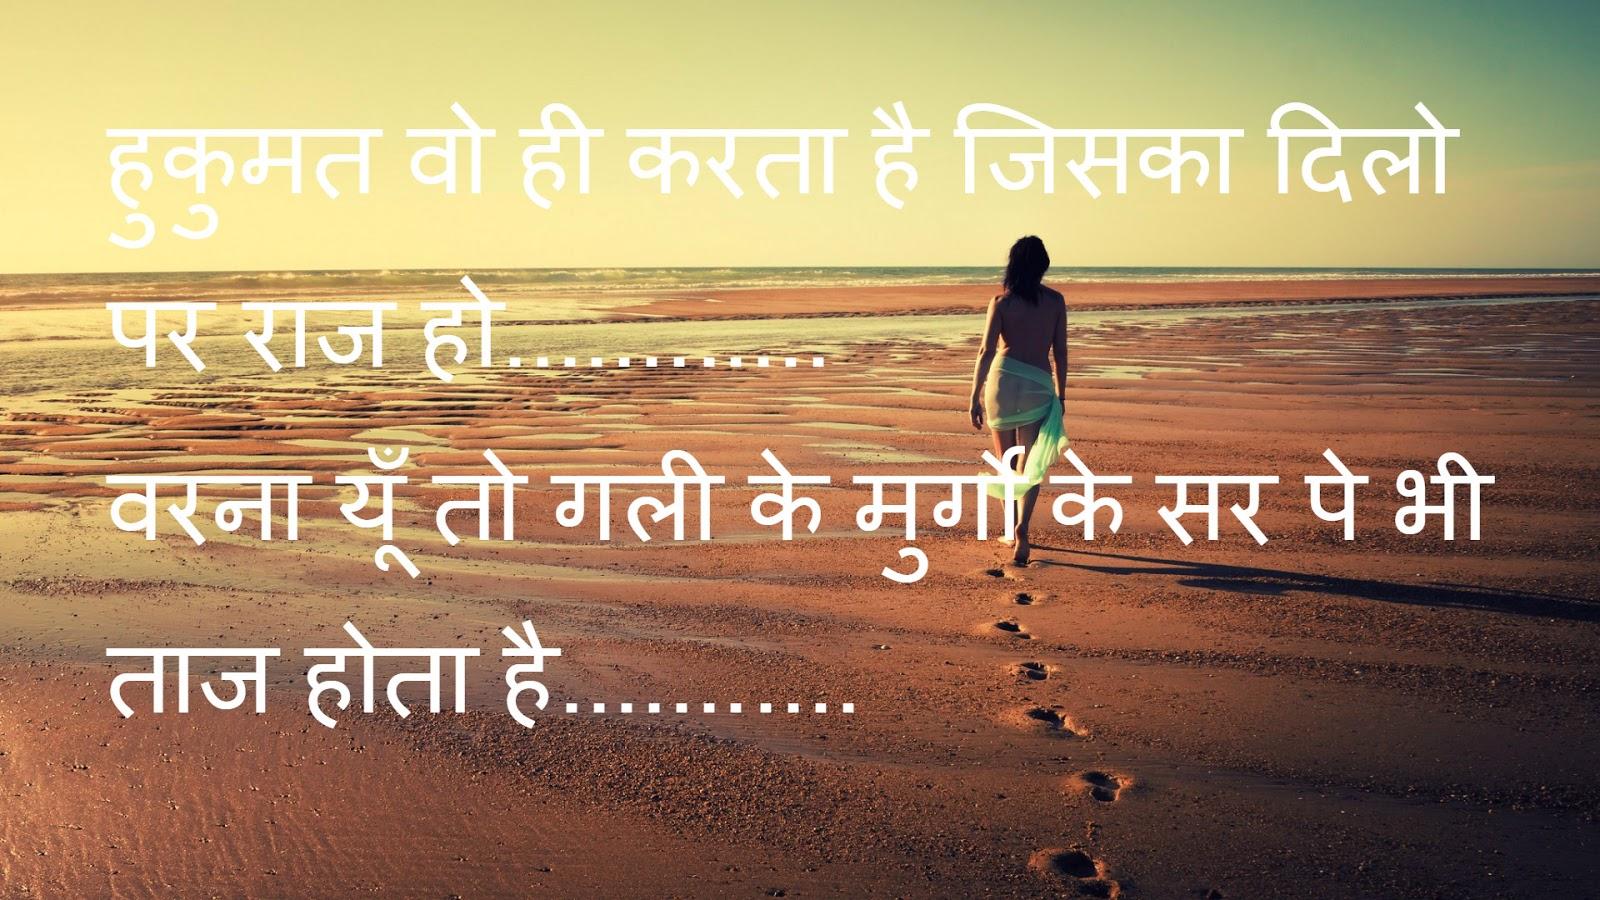 Wallpaper download attitude - Wallpaper Download Attitude Attitude Shayari In Hindi Wallpaper